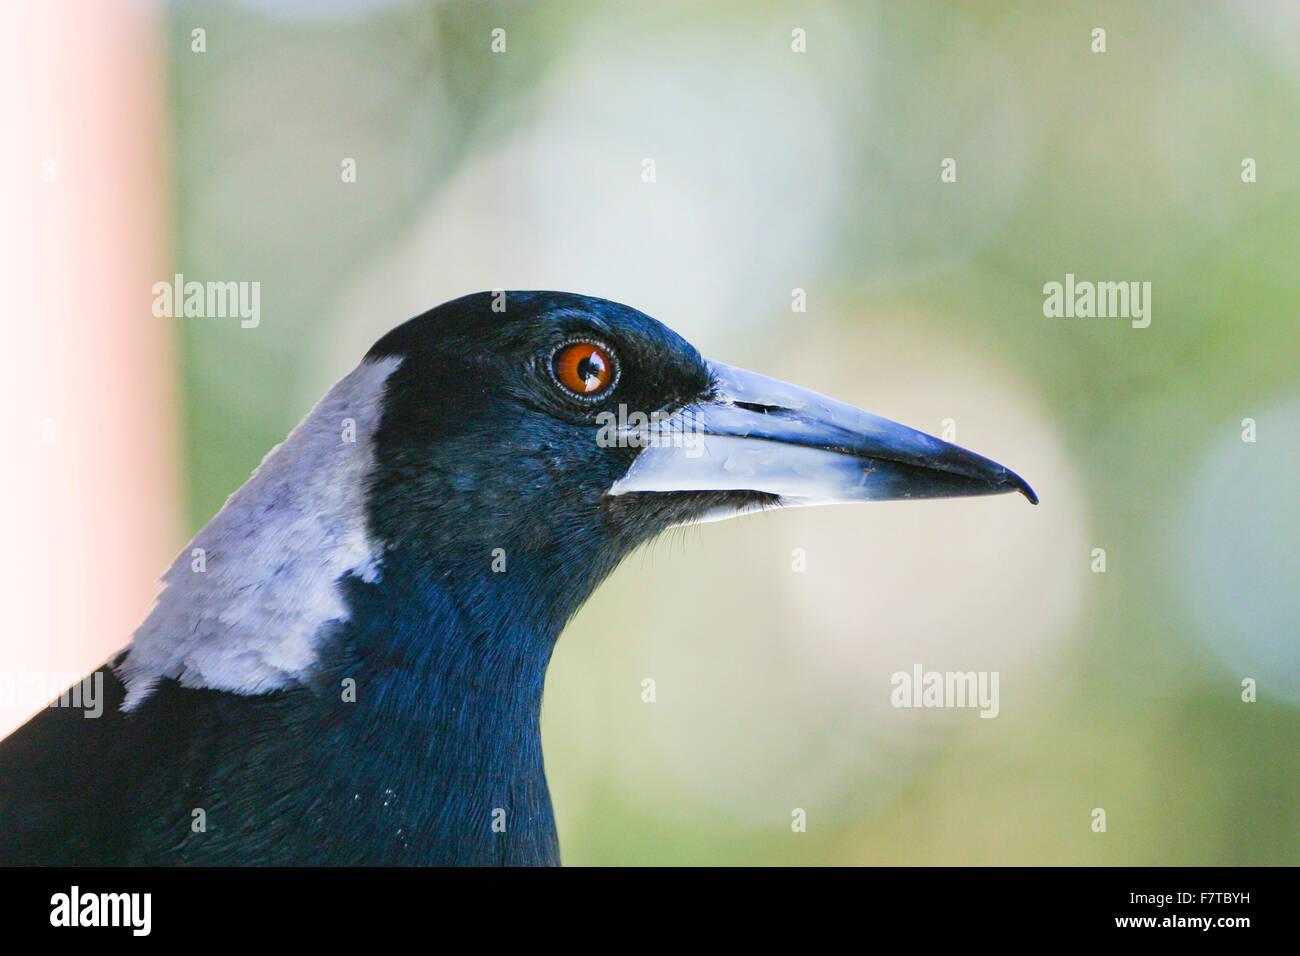 portrait of an Australian Magpie - Stock Image